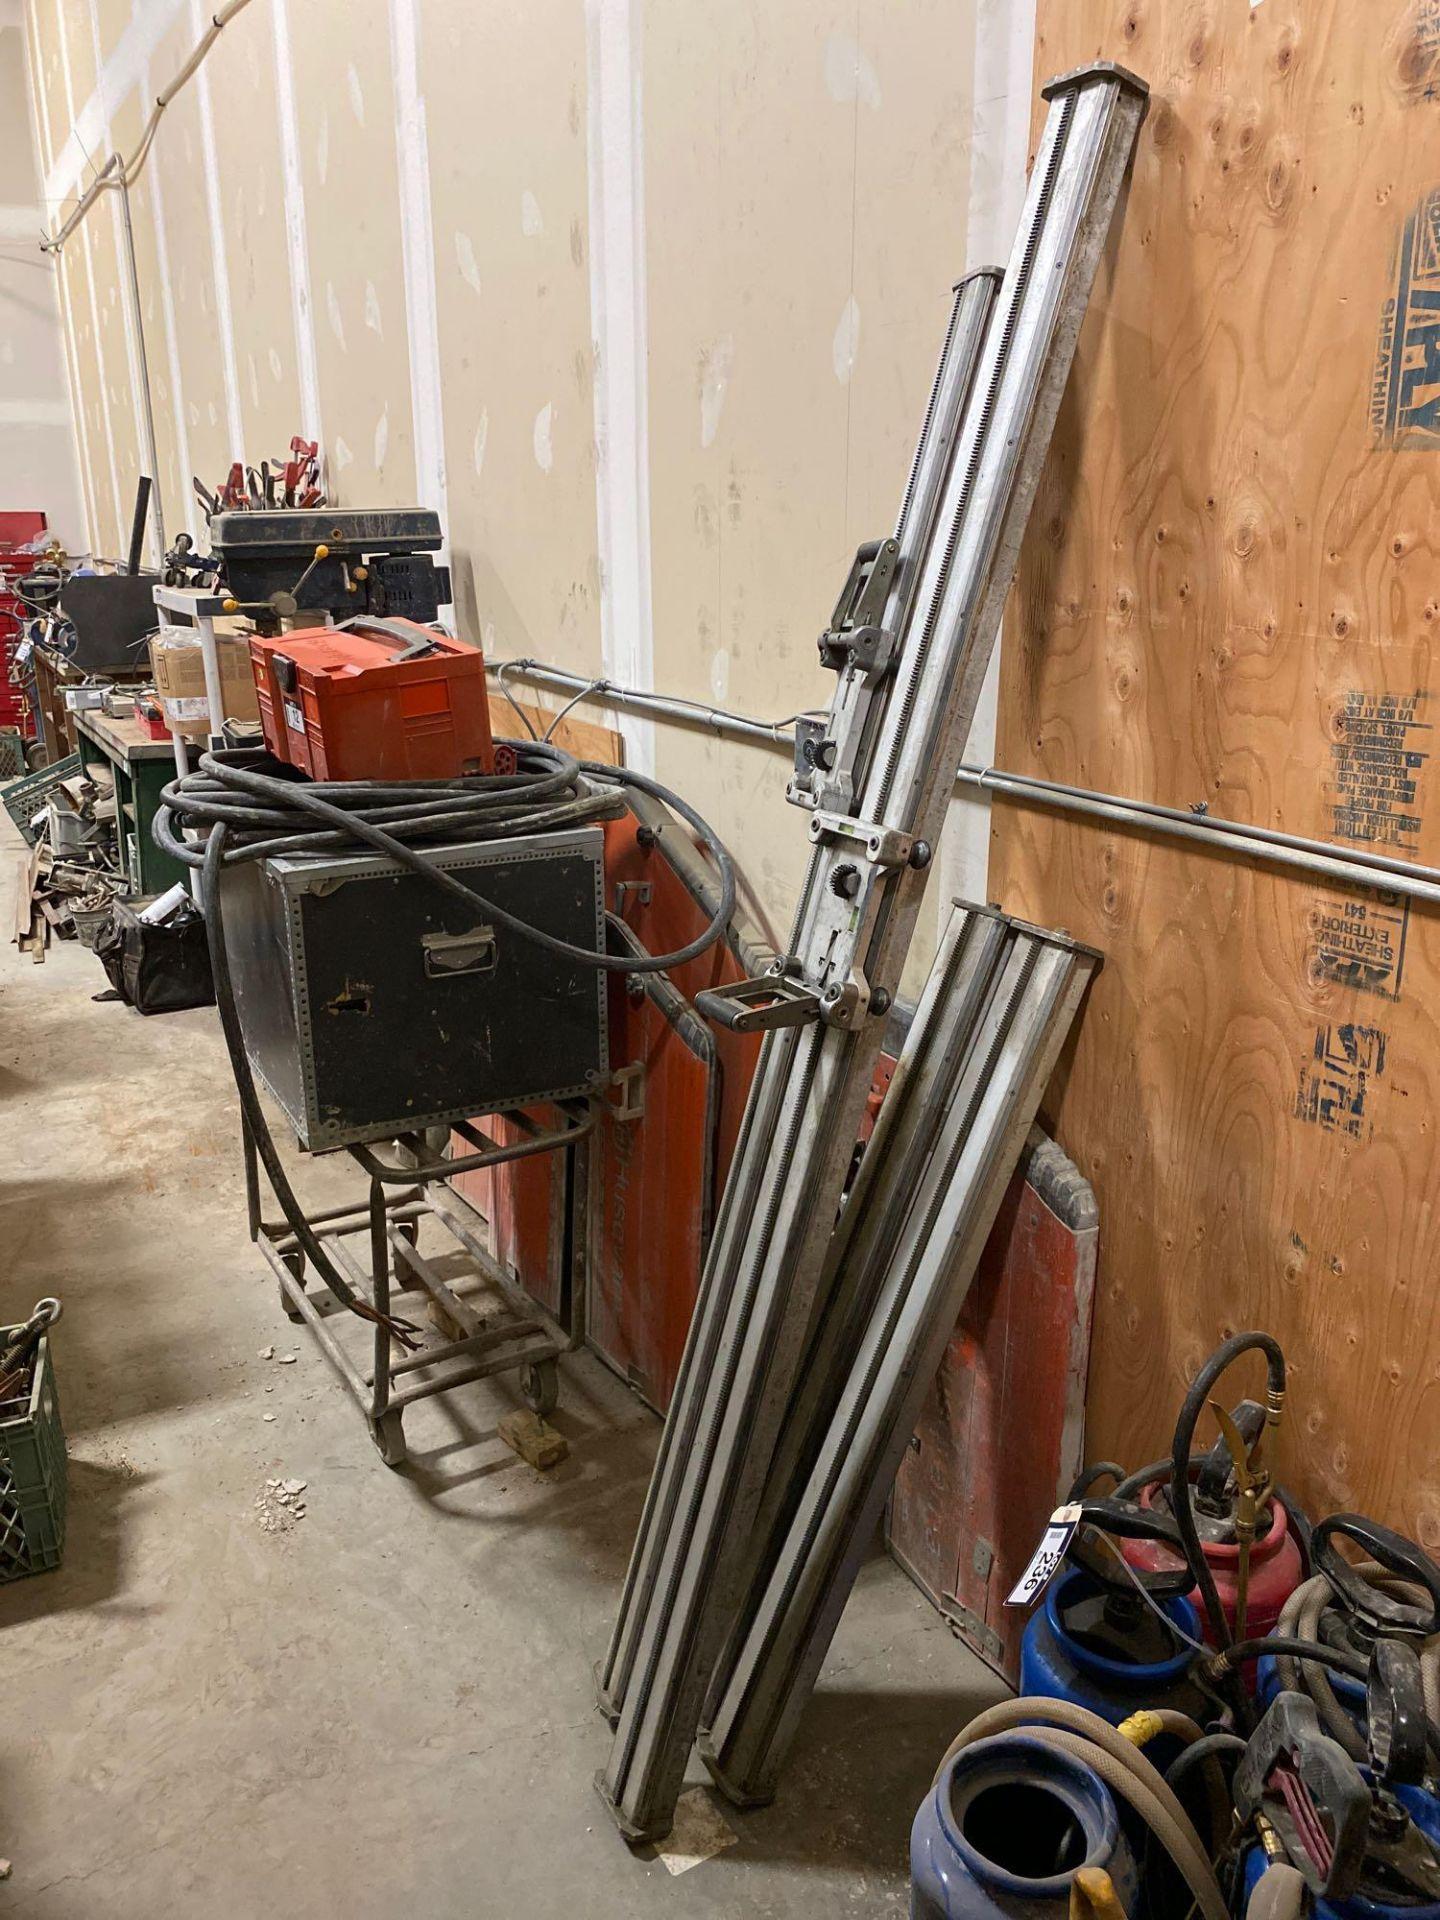 Husqvarna WS 440 HF Electric Wall Saw, Husqvarna PP 440 HF Power Pack, Track System, Blade Guards, e